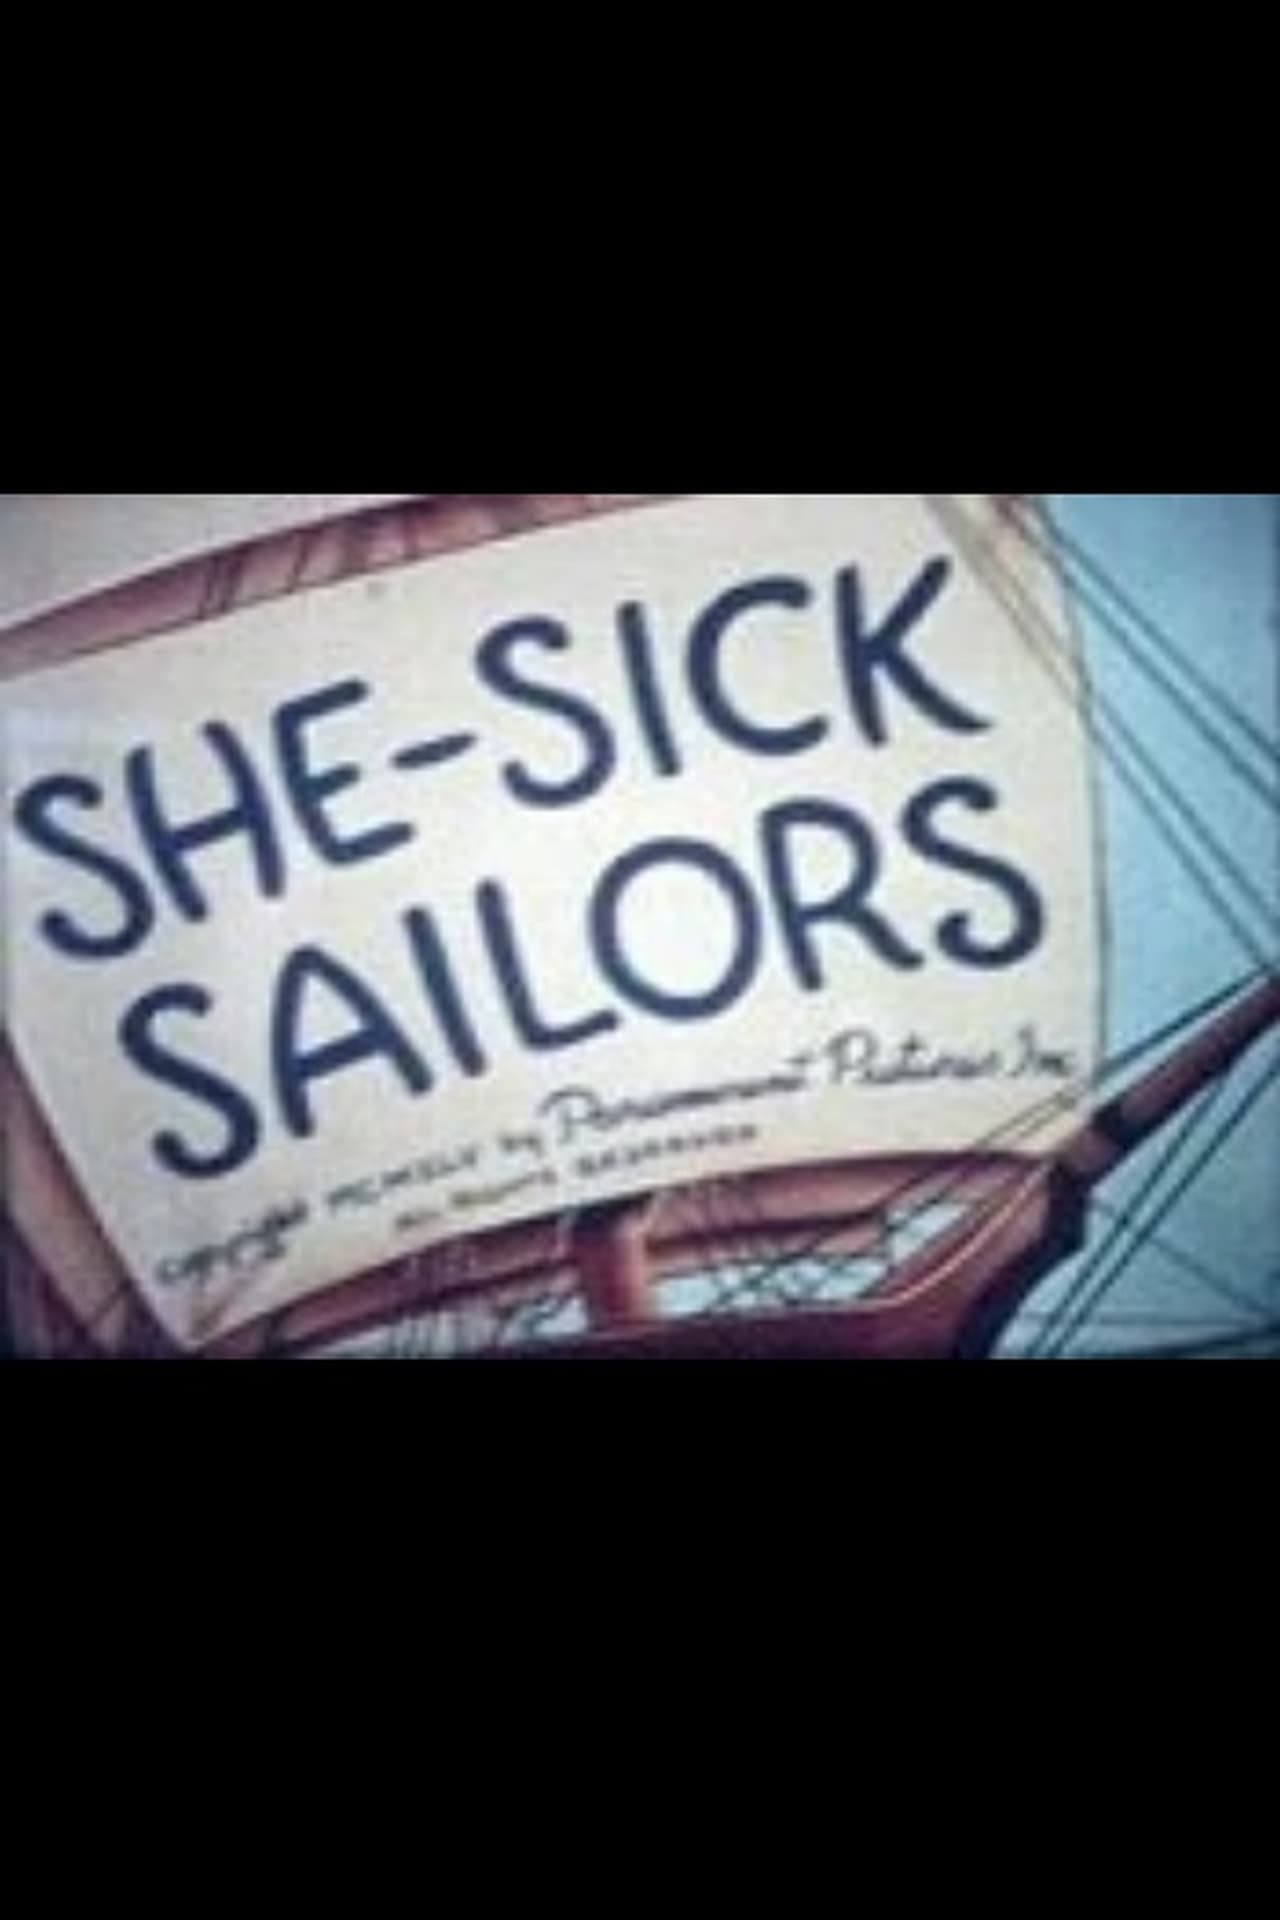 She-Sick Sailors